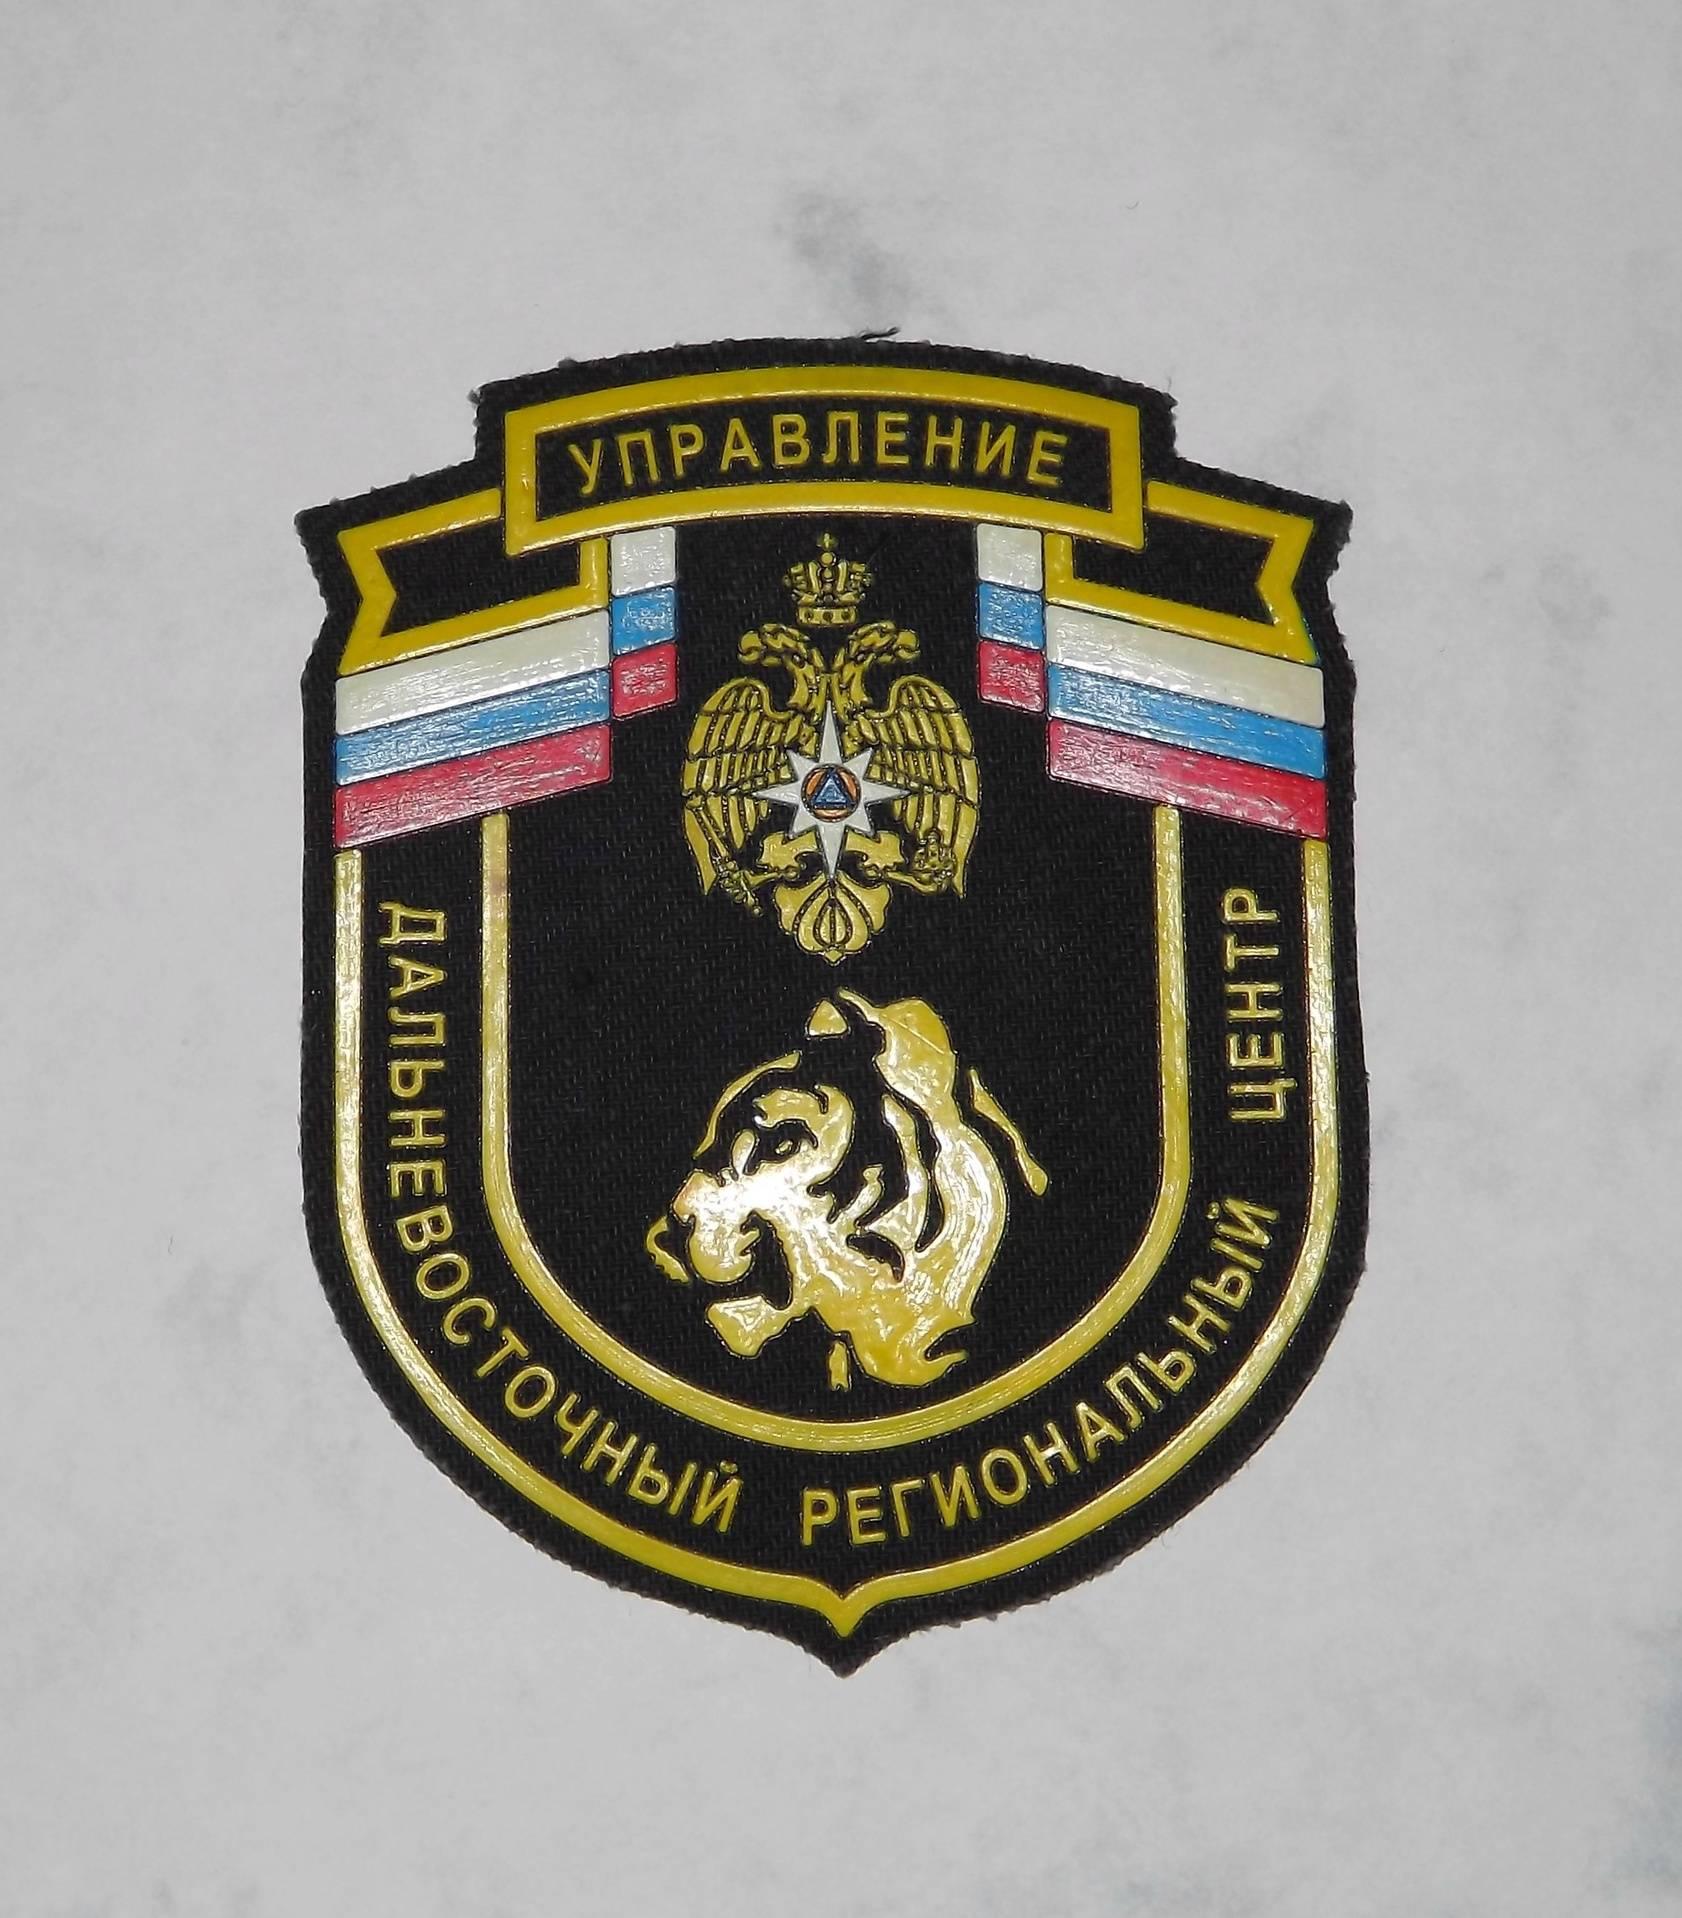 Russia - Fire Service Far Eastern Regional Center